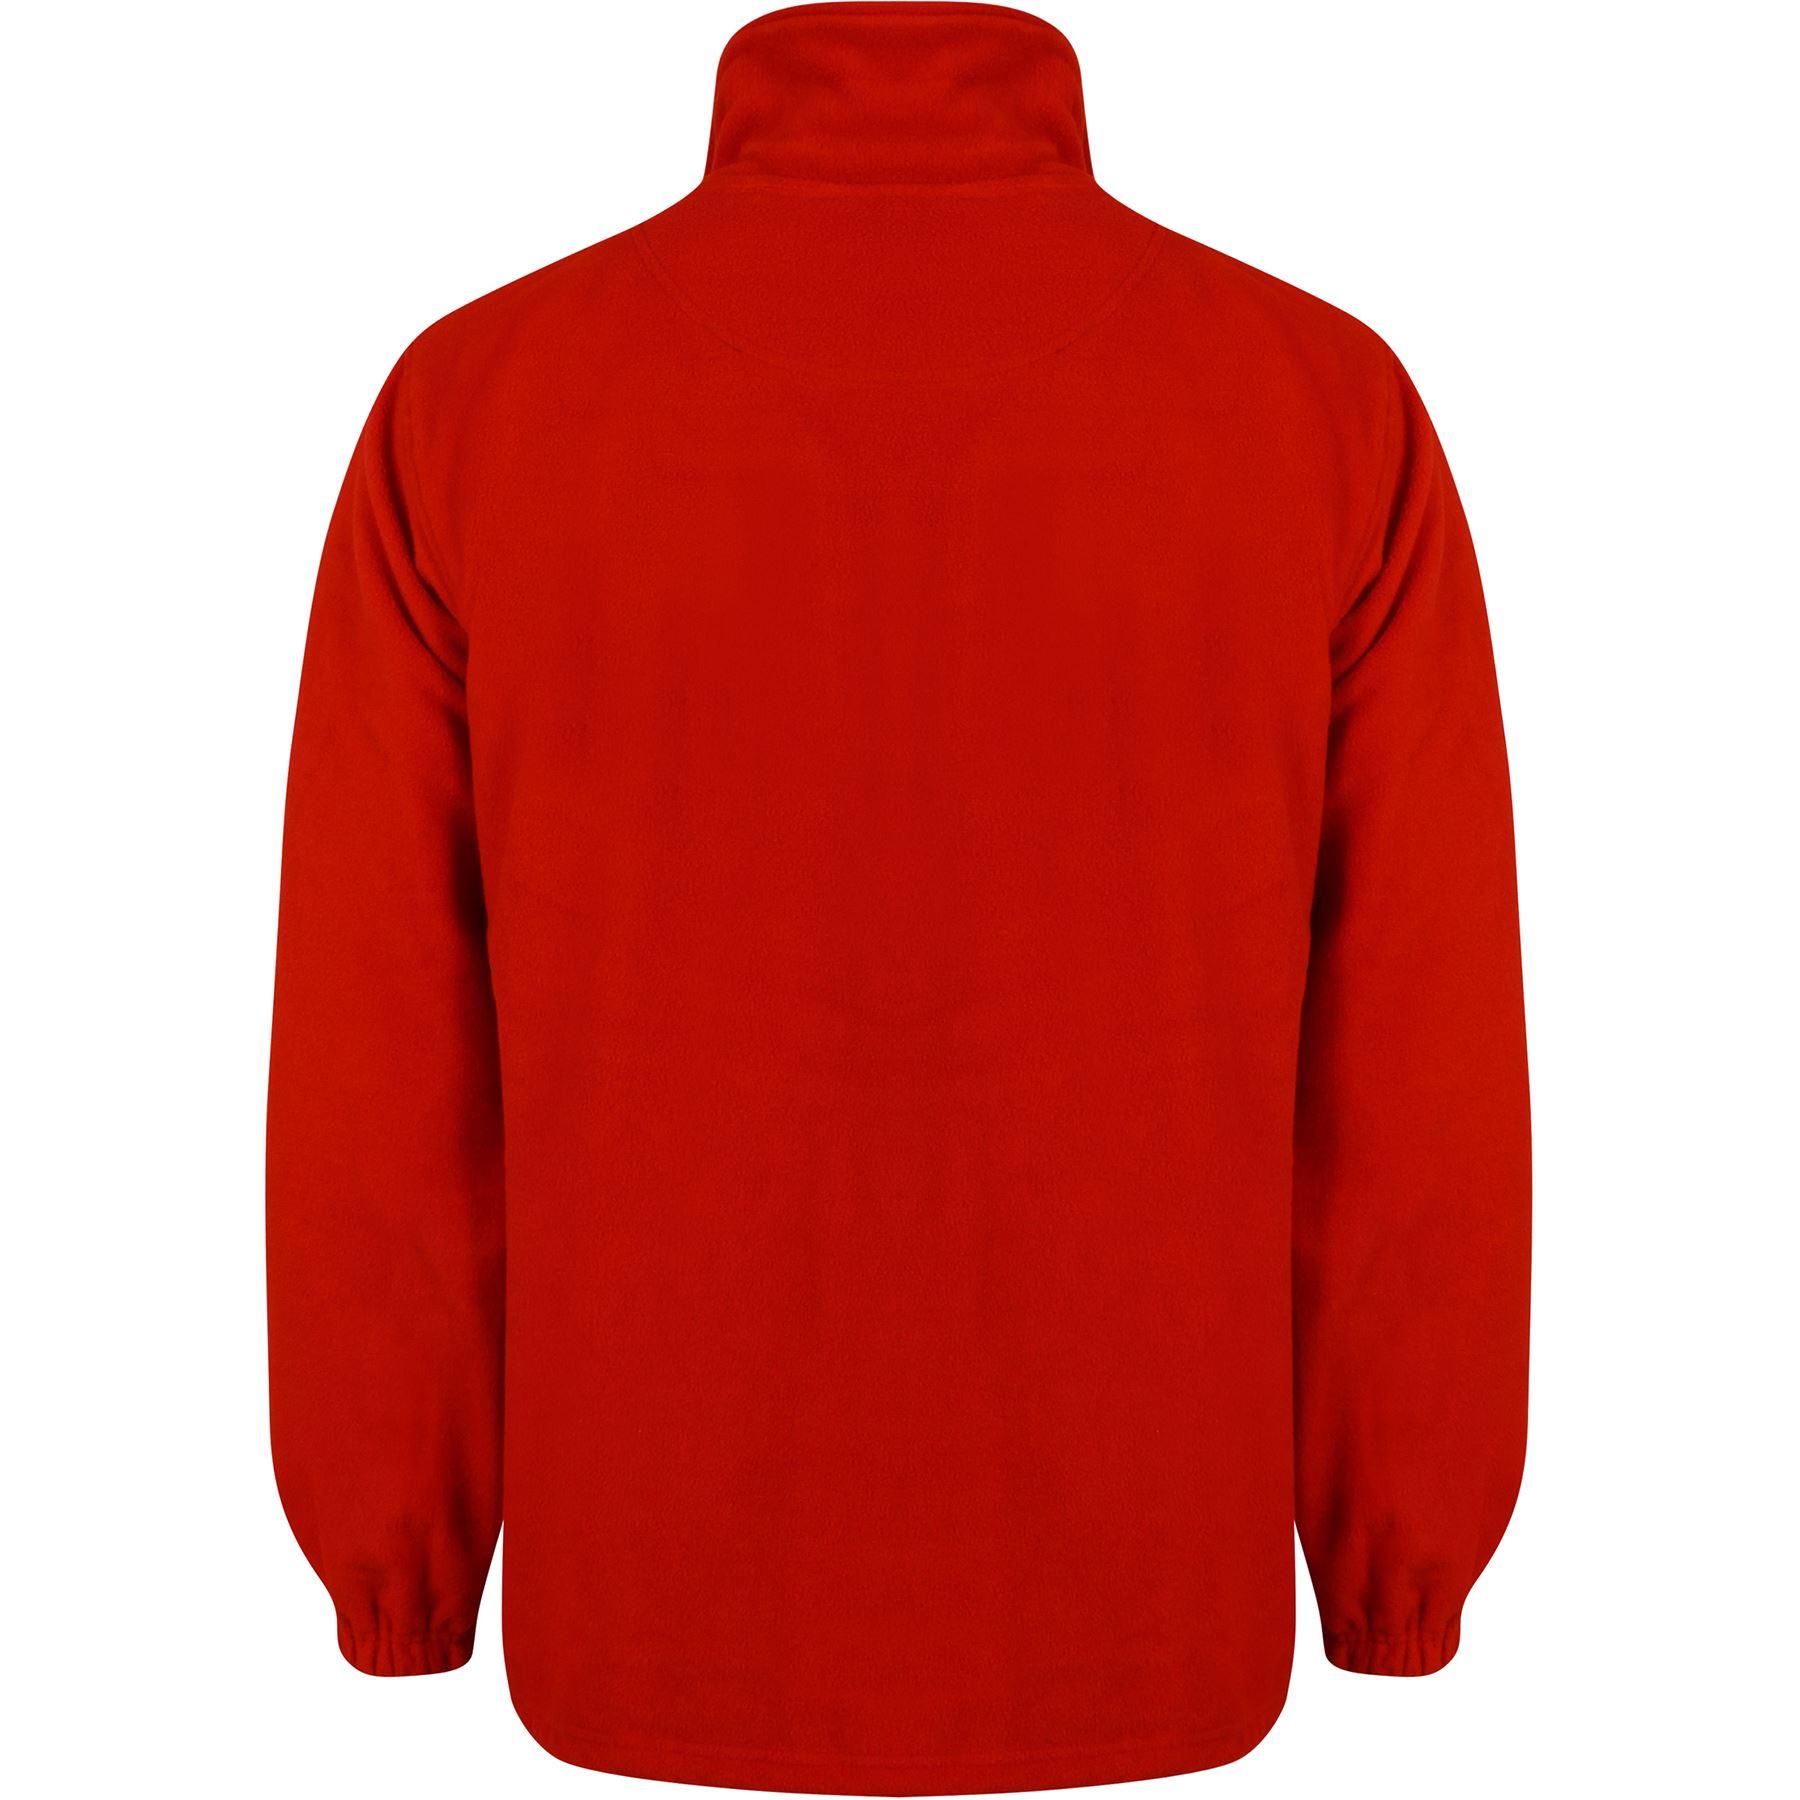 New Mens Anti Pill Zip Up Jacket Polar Fleece Winter Casual Work Wear Warm Coat